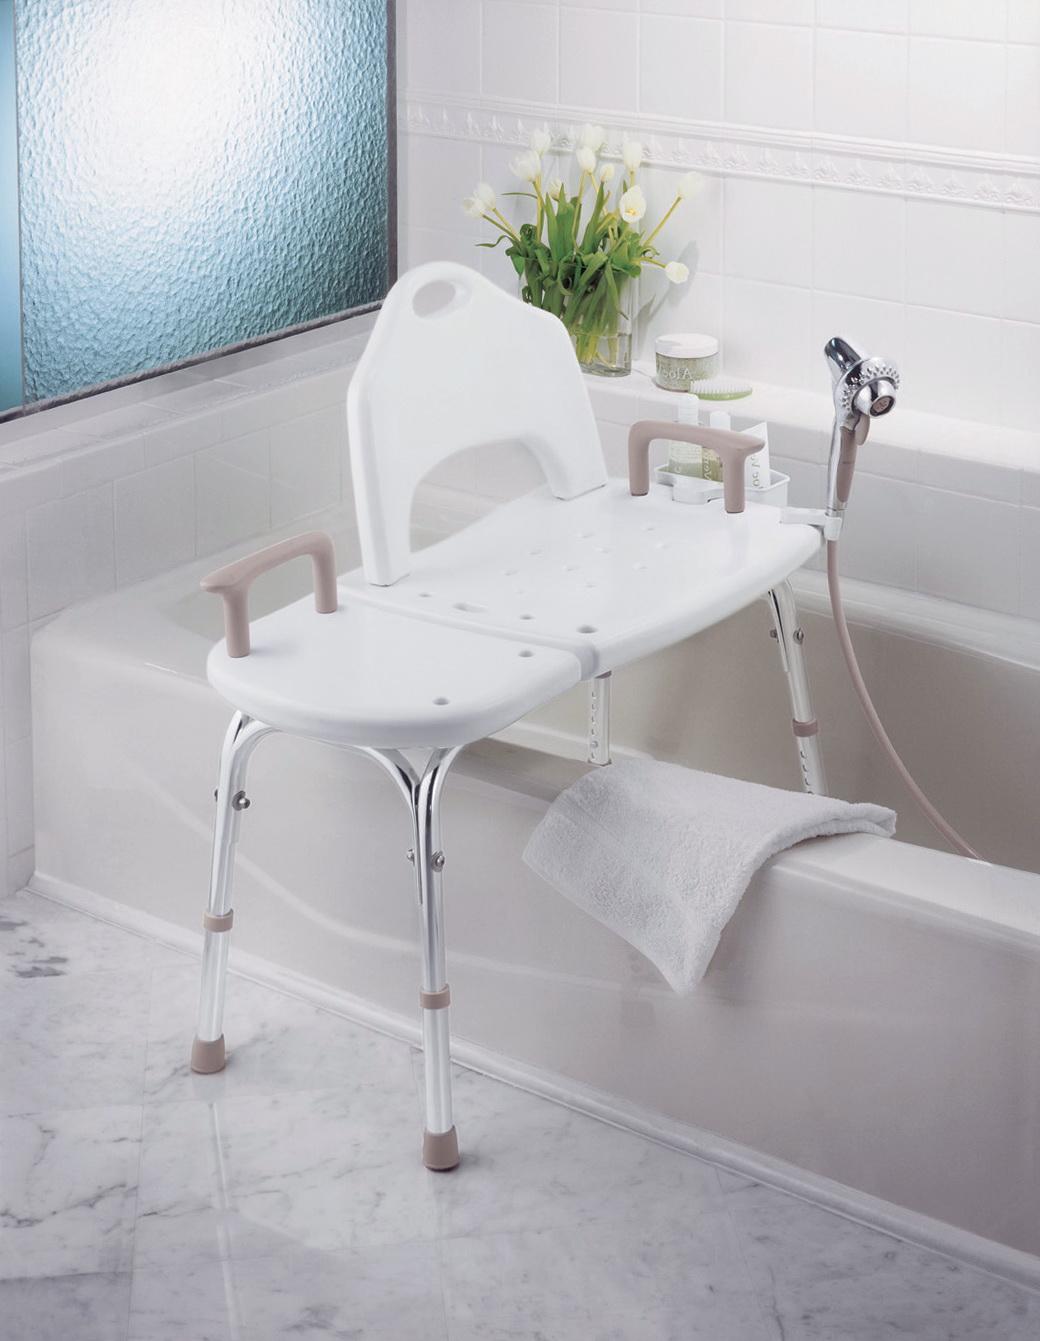 bench image chair spa medical shower stool bathtub us sf transfer bath seat itm mefeir loading is bathroom